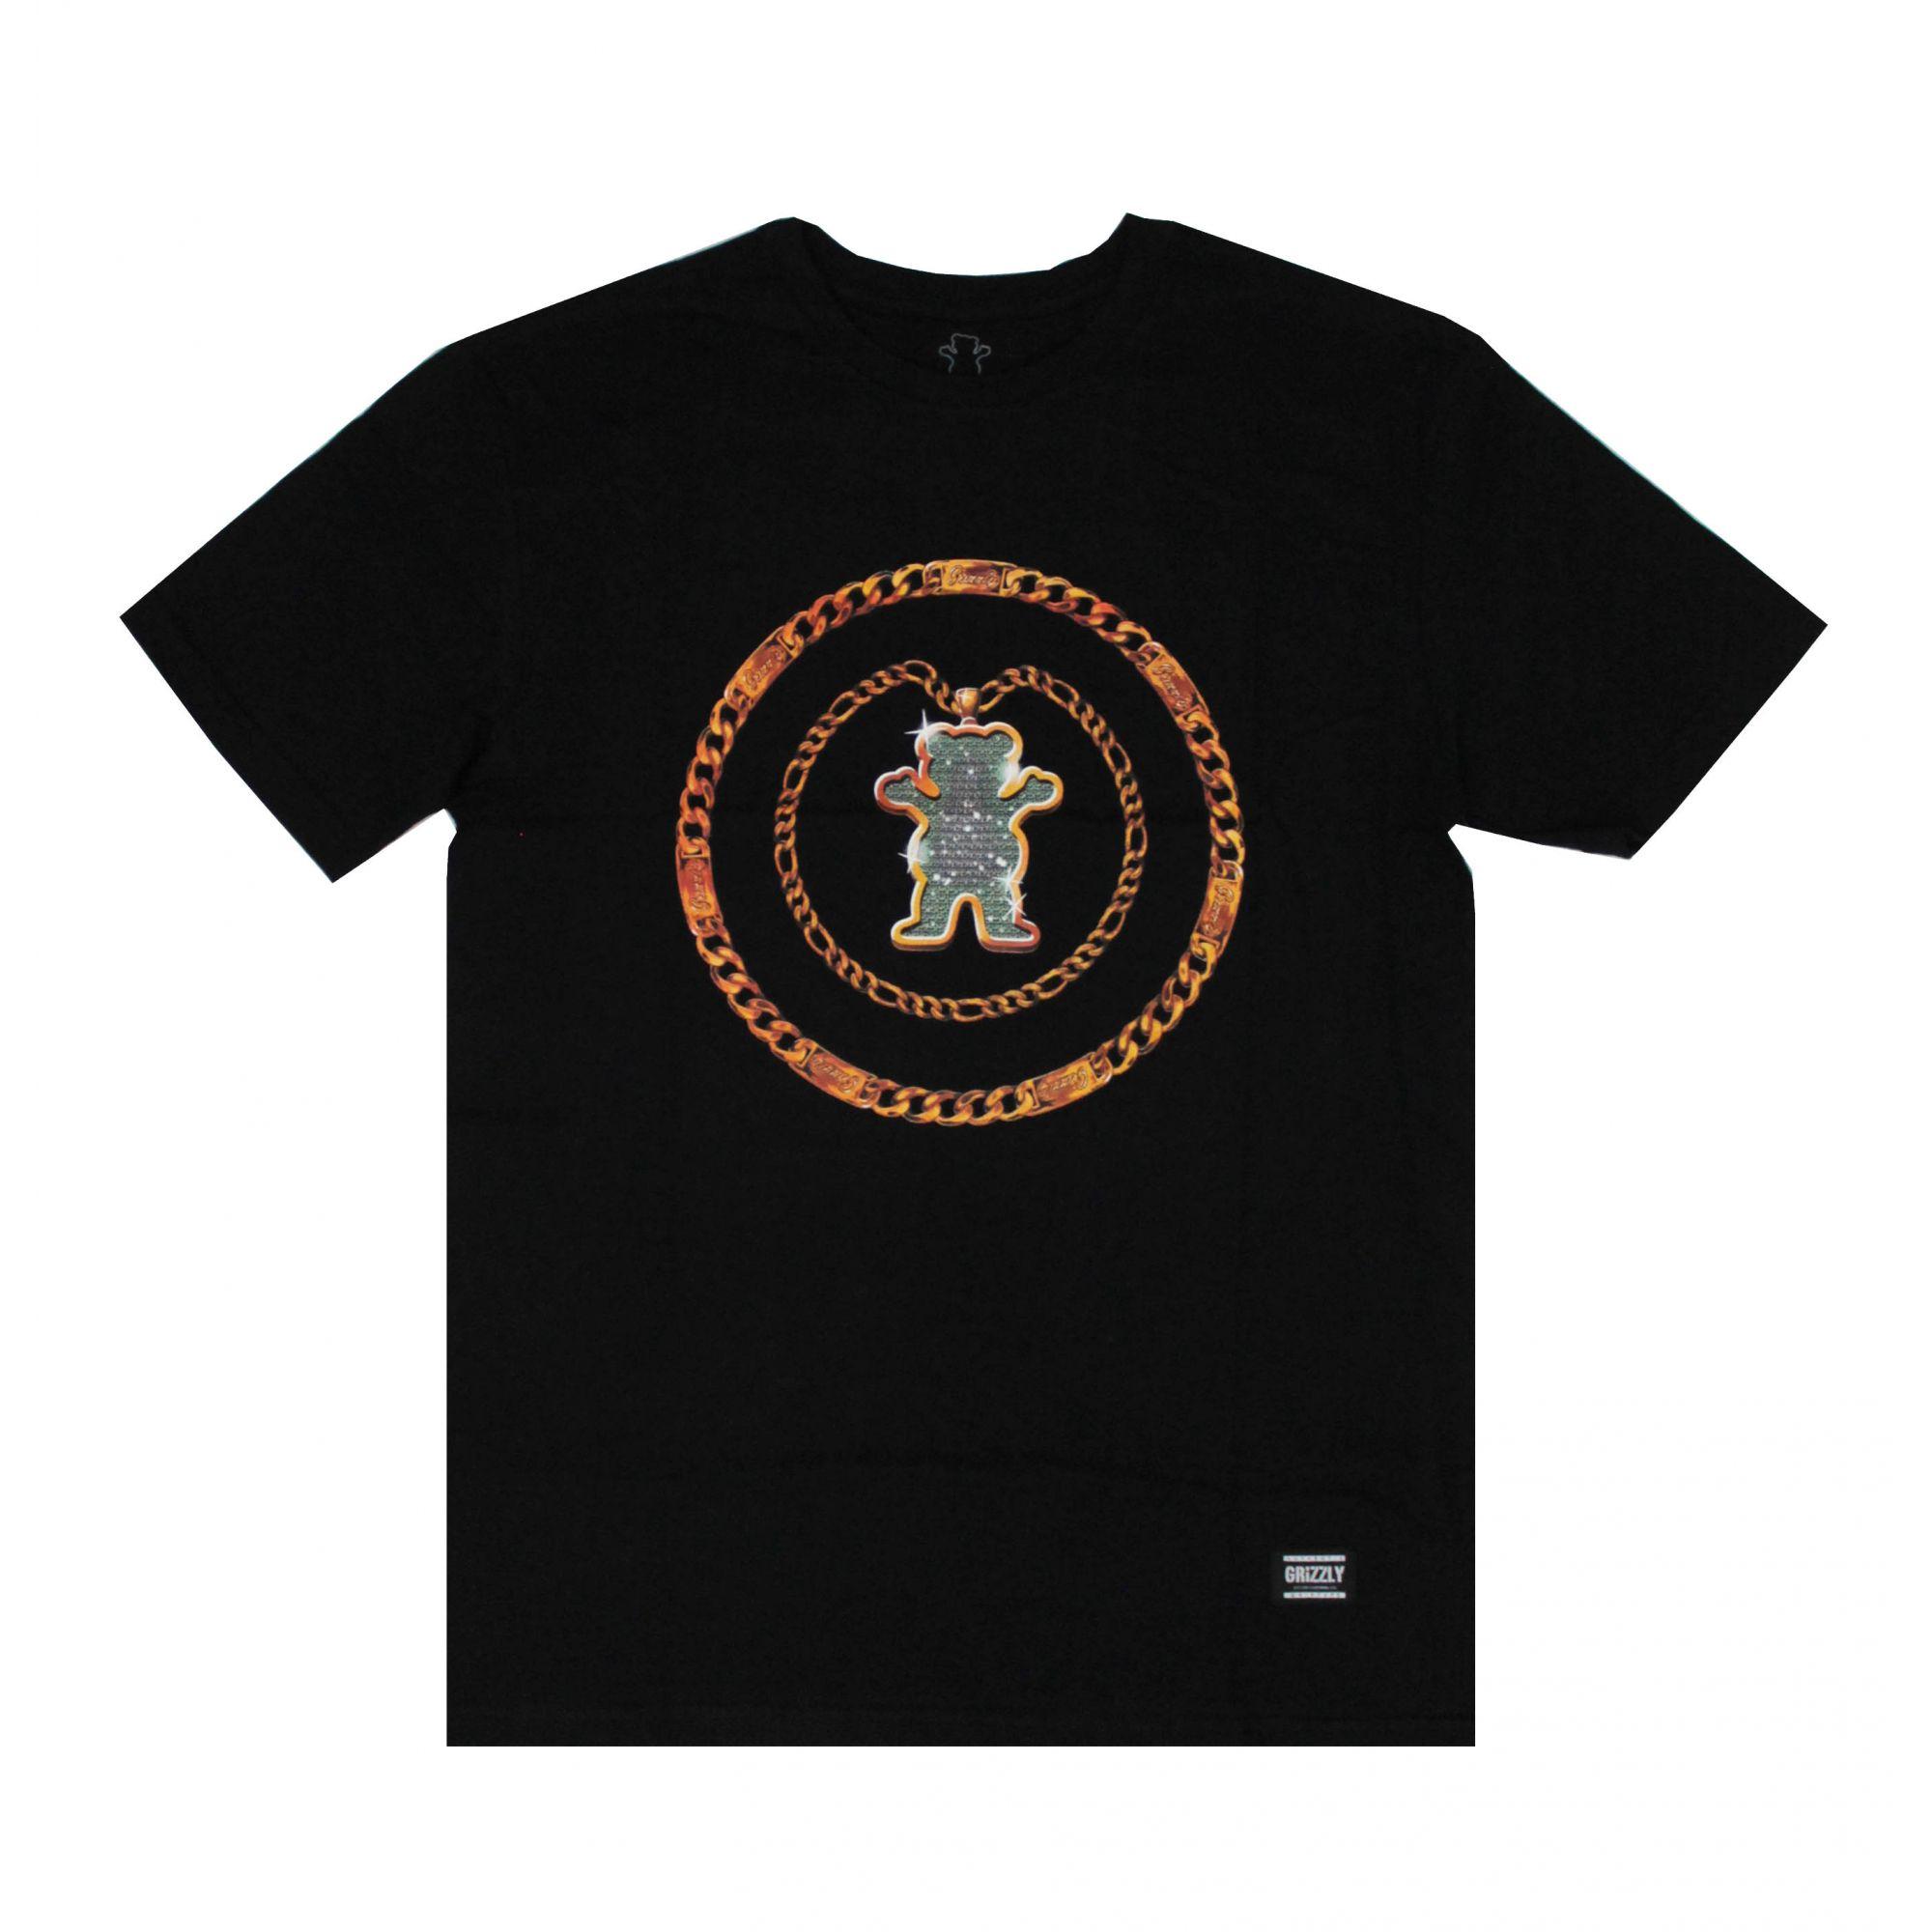 Camiseta Grizzly Chain Tee Preto